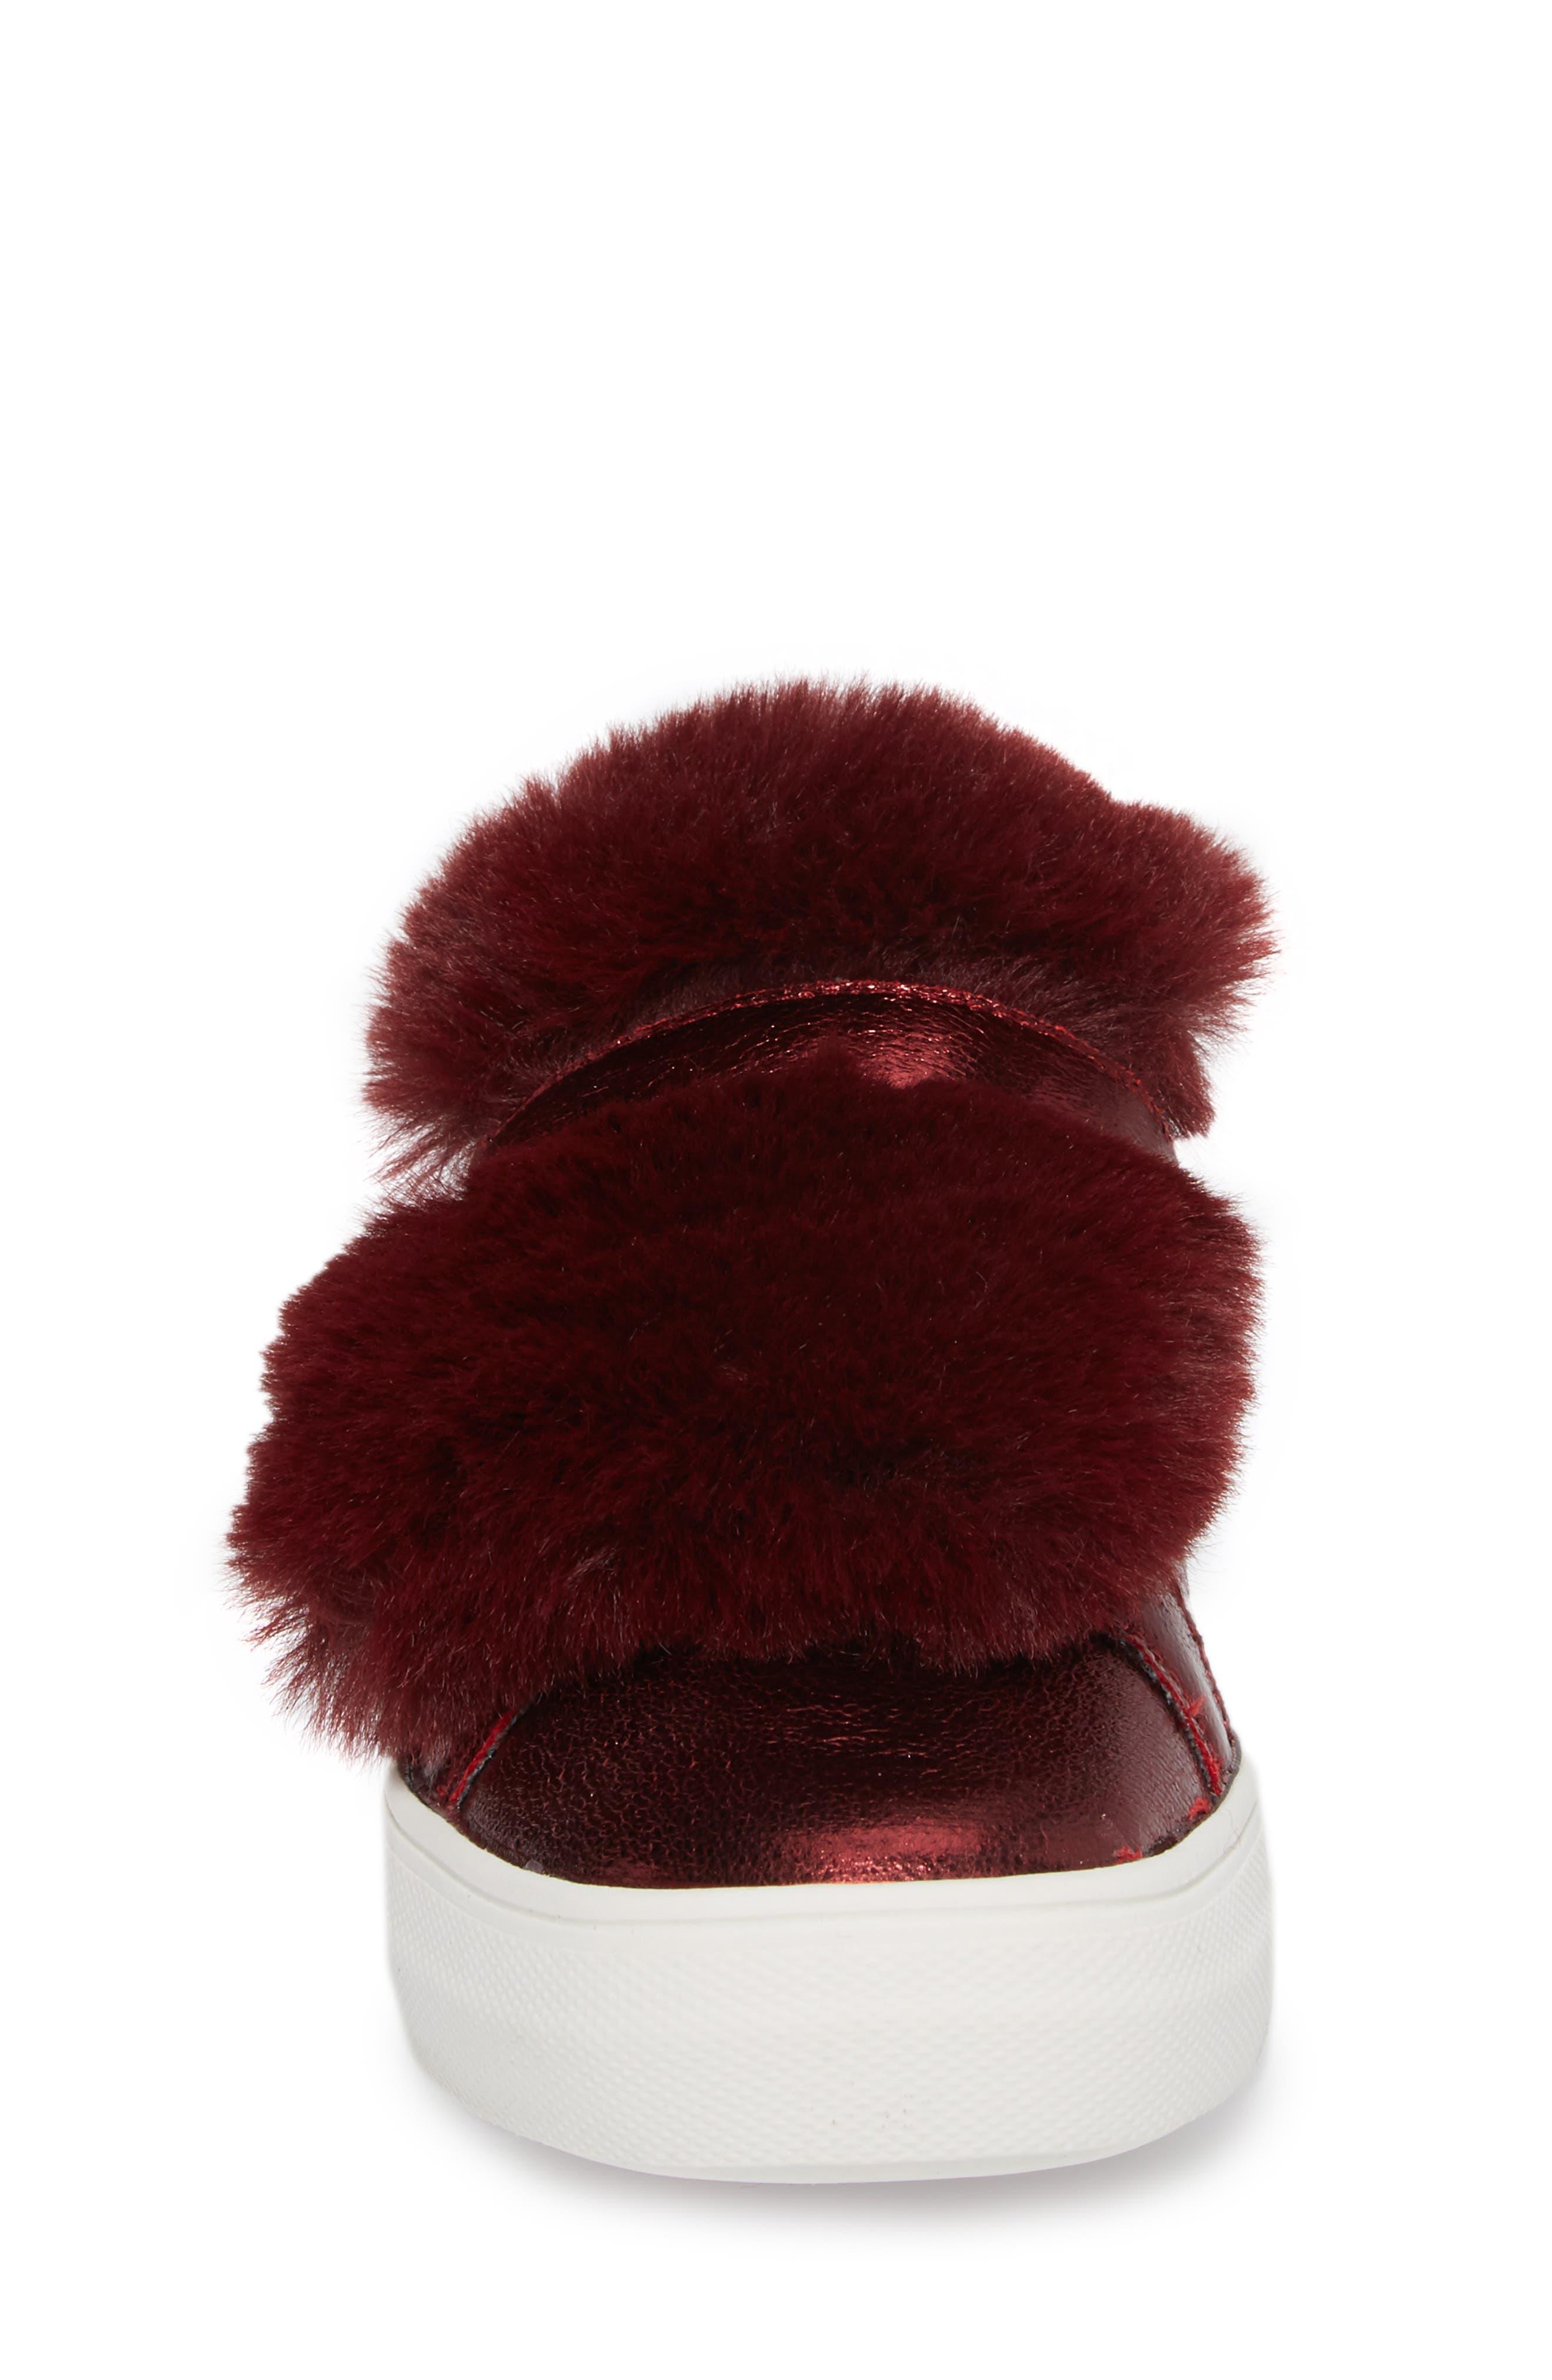 Zandra Faux Fur Metallic Sneaker,                             Alternate thumbnail 4, color,                             Burgundy Faux Leather